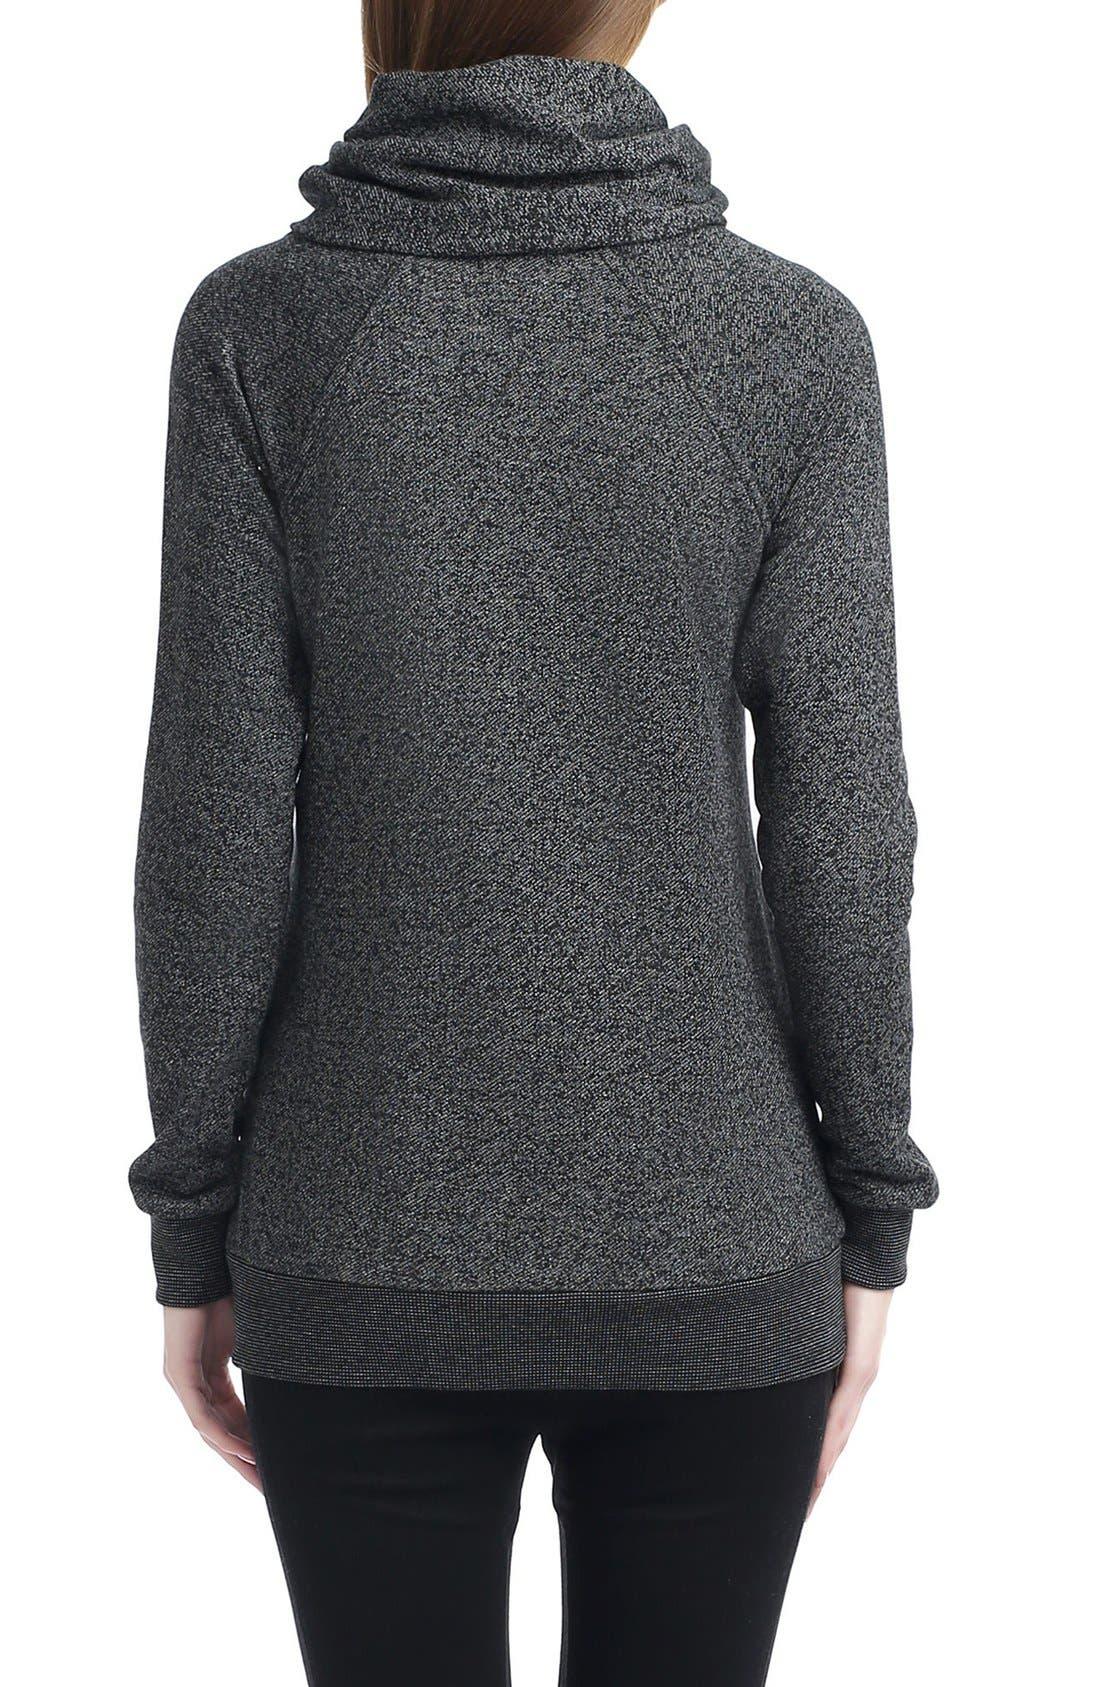 'Thea' Zip Collar Maternity Sweatshirt,                             Alternate thumbnail 2, color,                             BLACK